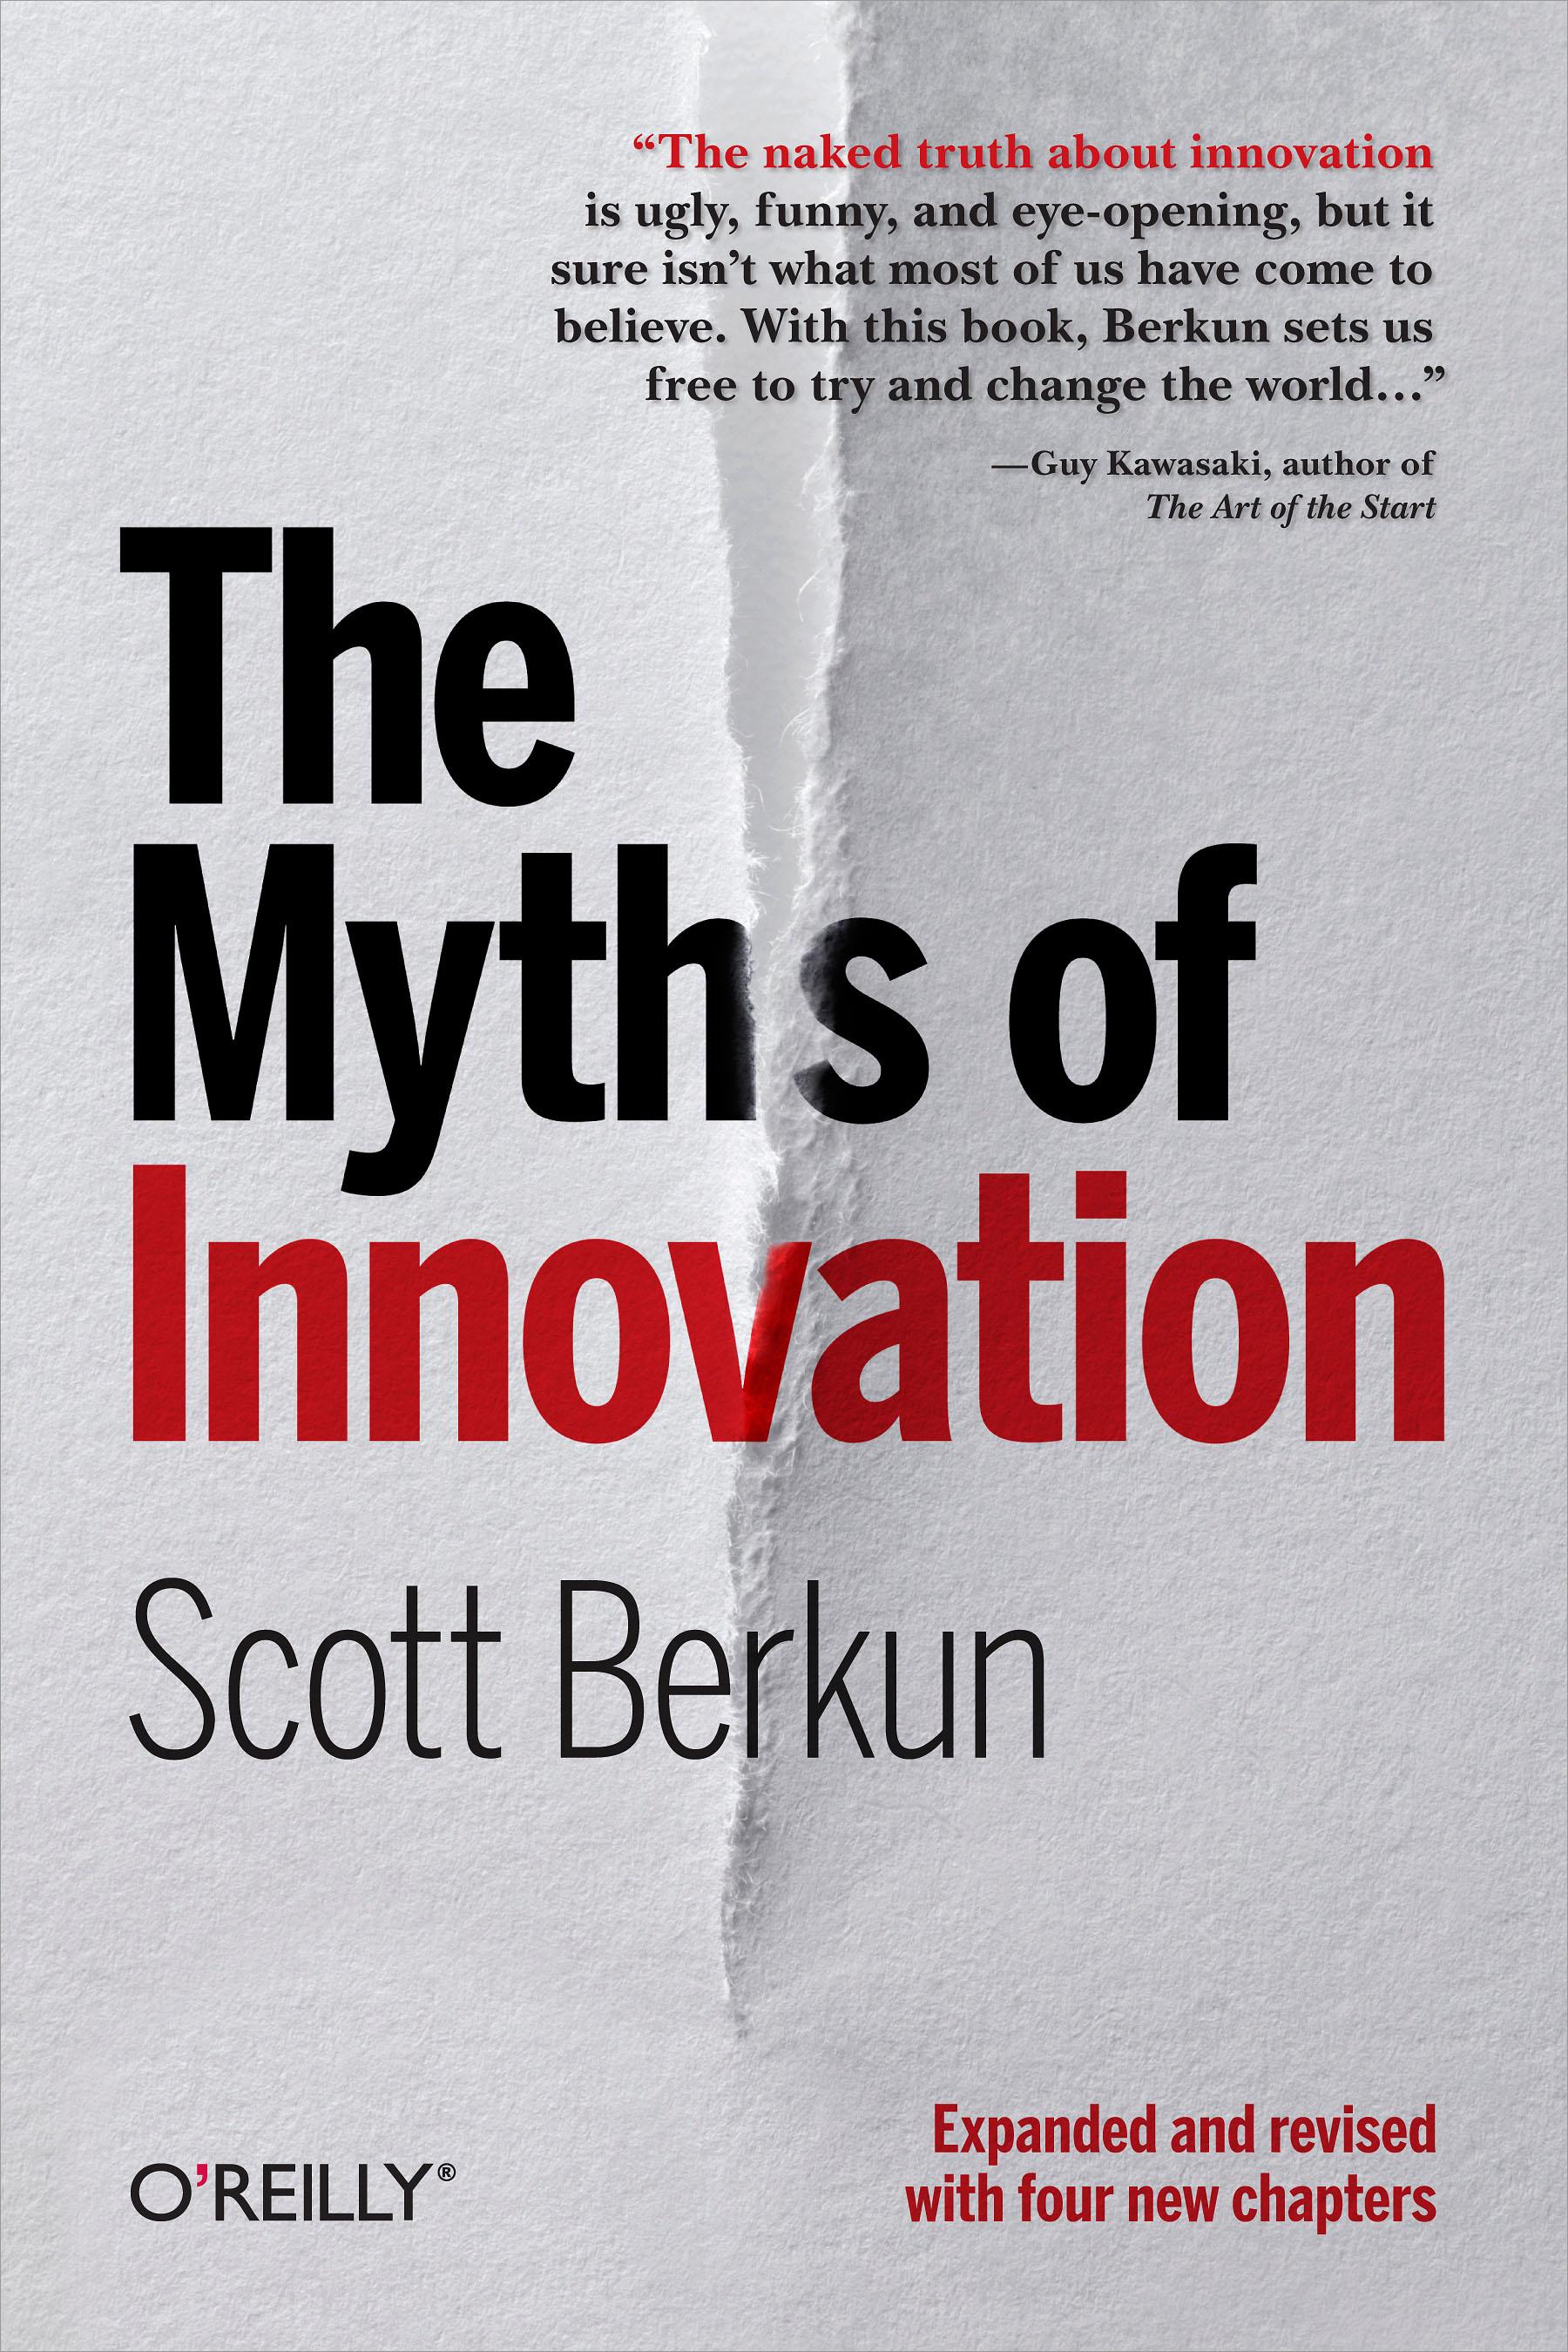 Download Ebook The Myths of Innovation by Scott Berkun Pdf